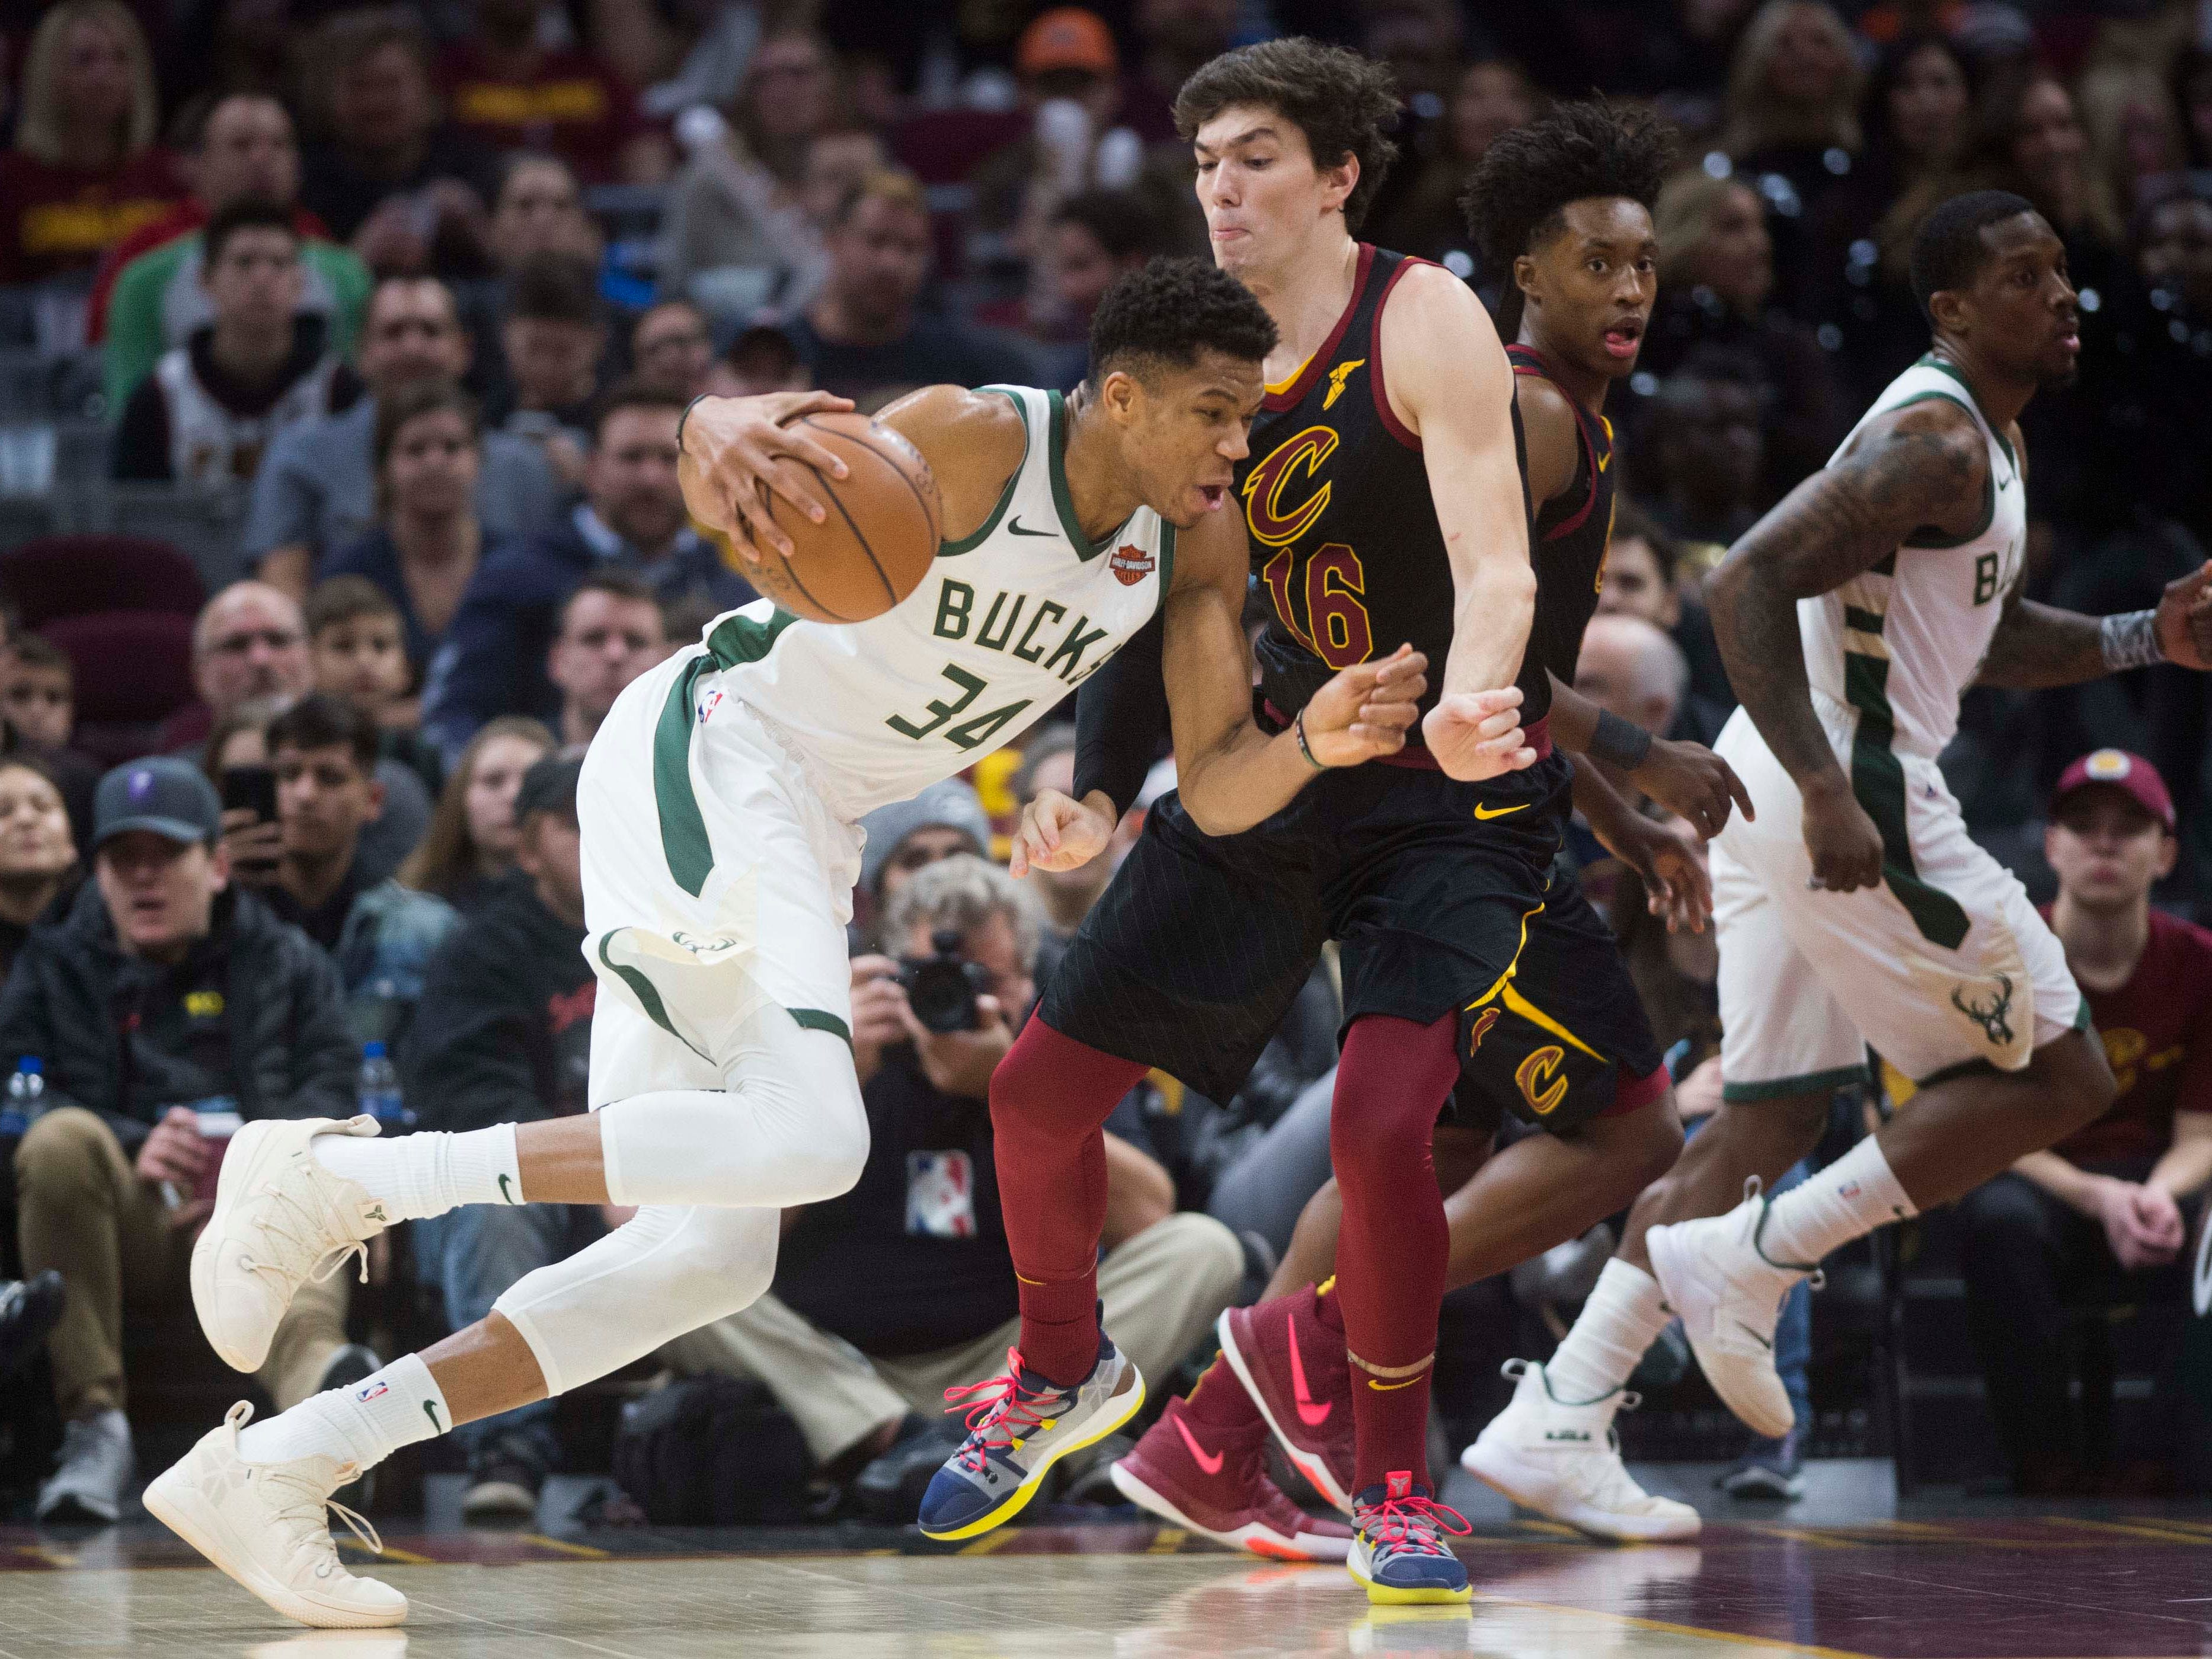 Bucks forward Giannis Antetokounmpo drives to the basket against Cleveland Cavaliers forward Cedi Osman.